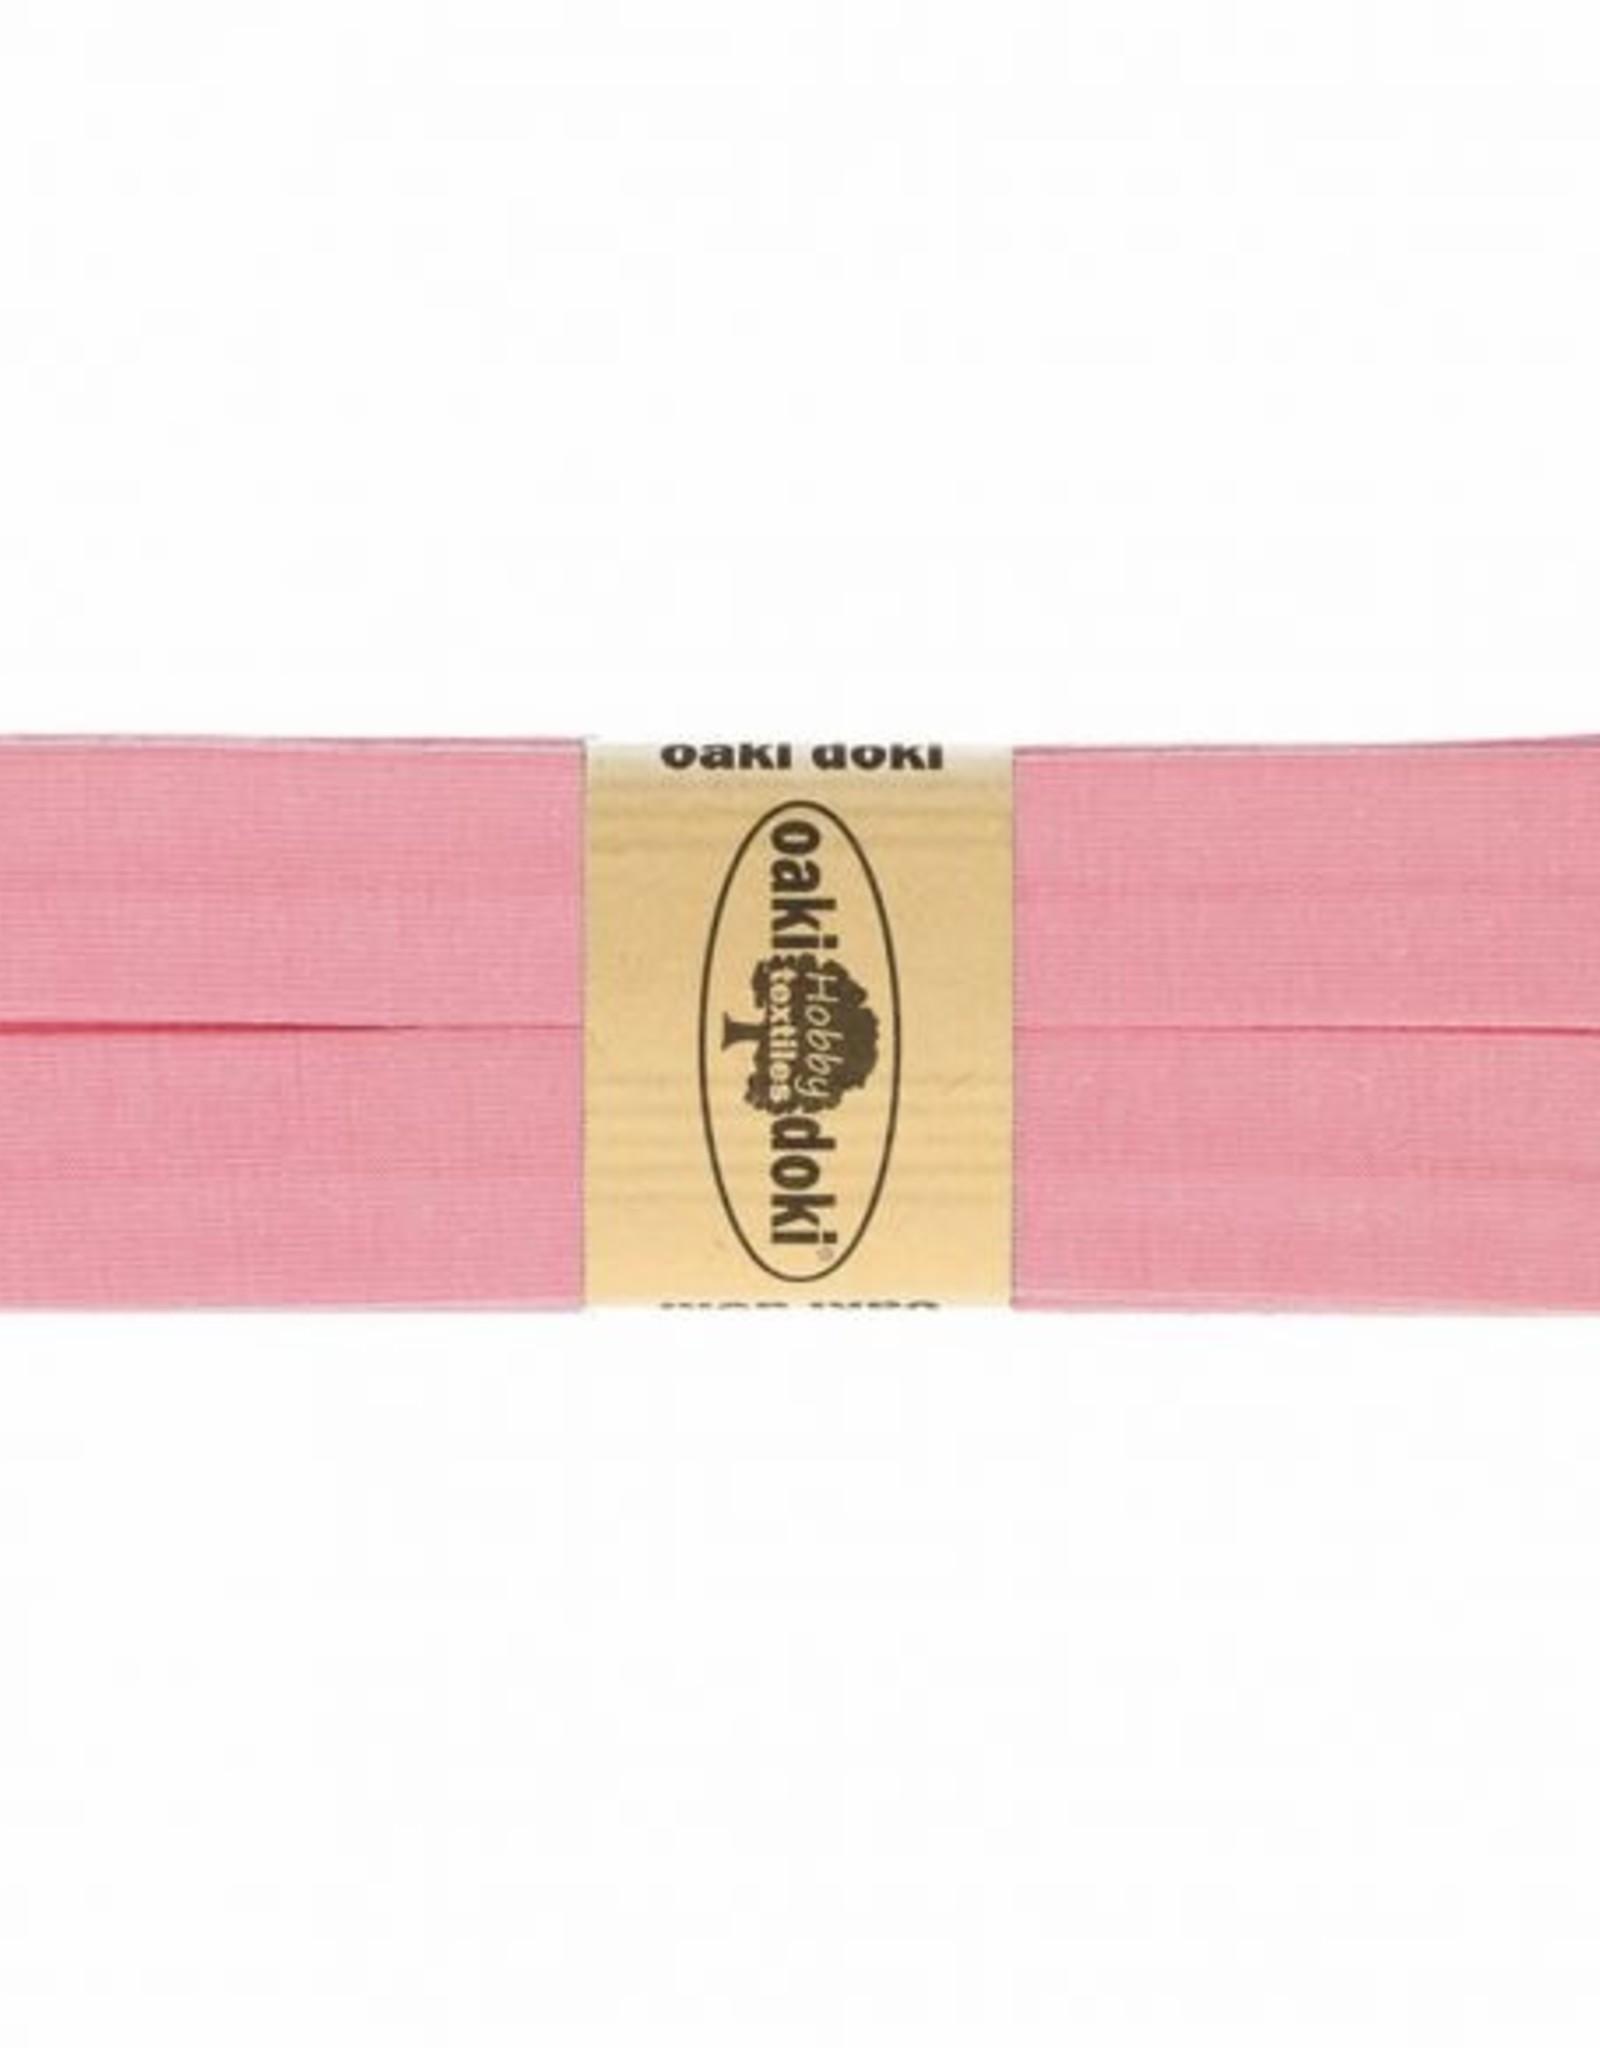 Oaki Doki Tricot de luxe jersey biaisband 20mm x 3m 016